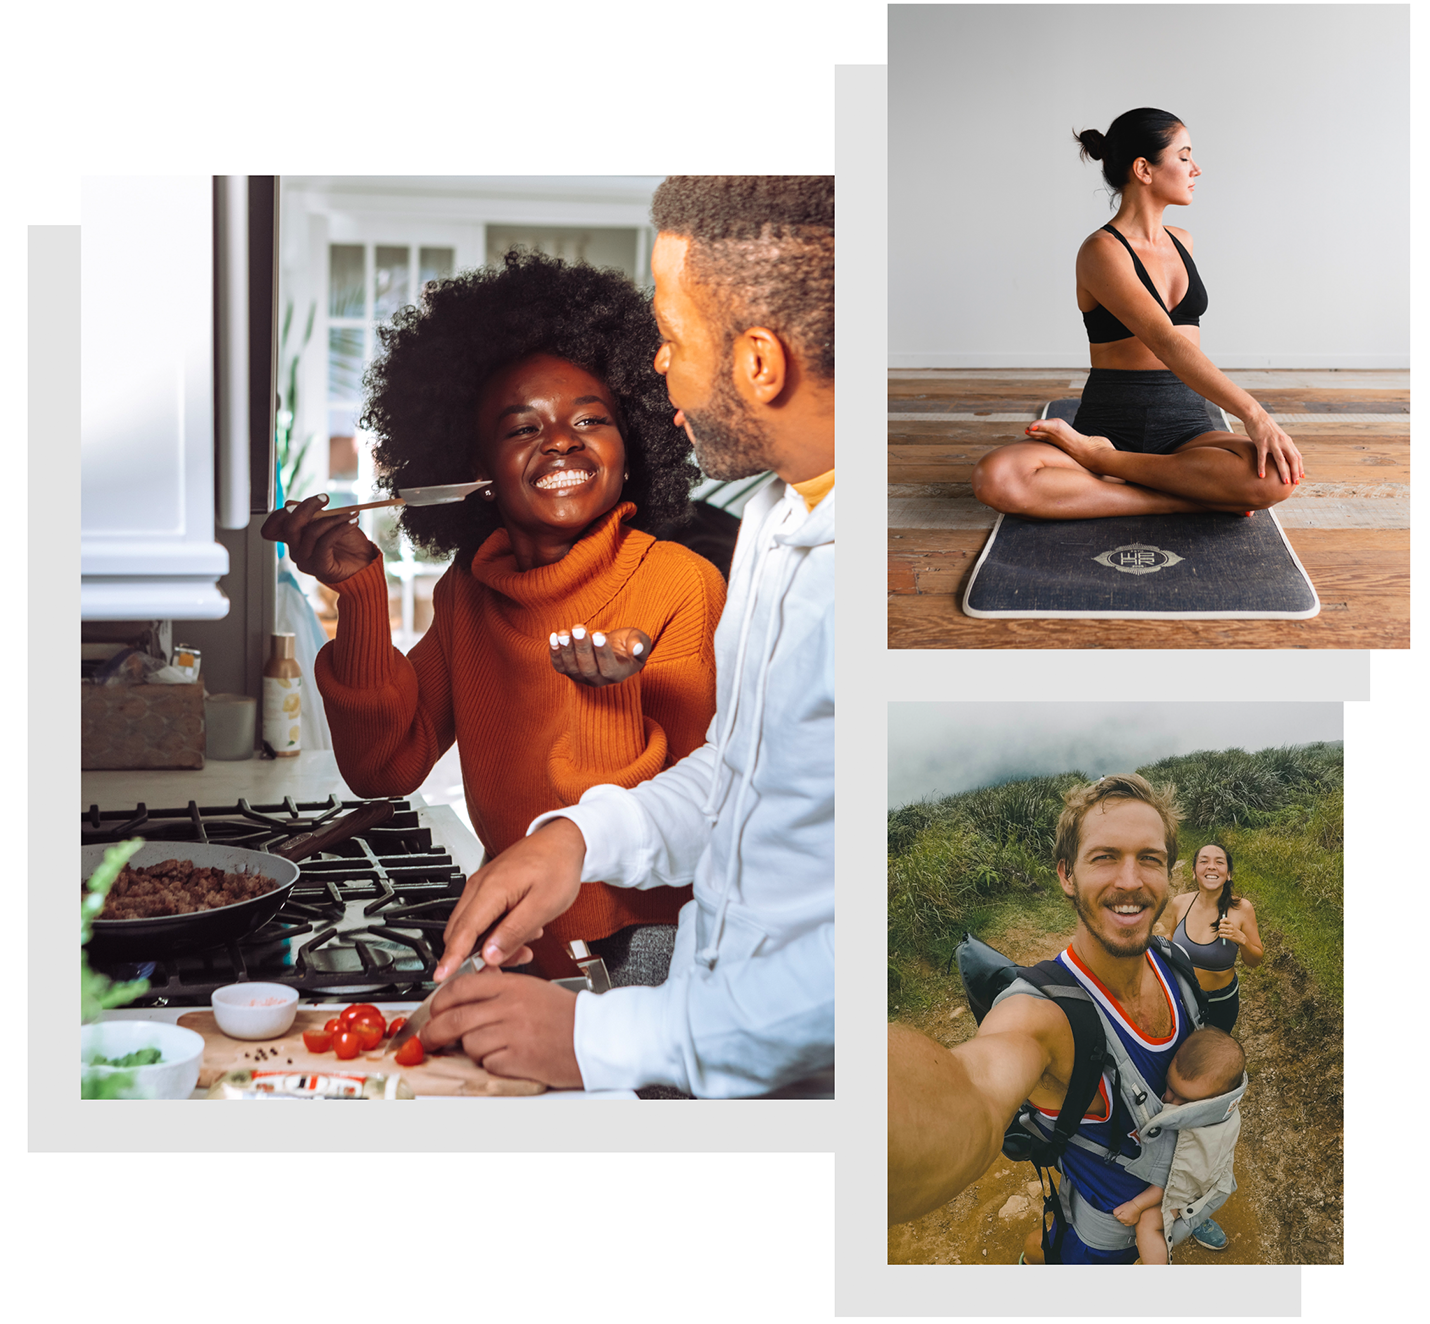 Homepage Hero Image - people hiking, eating, exercising